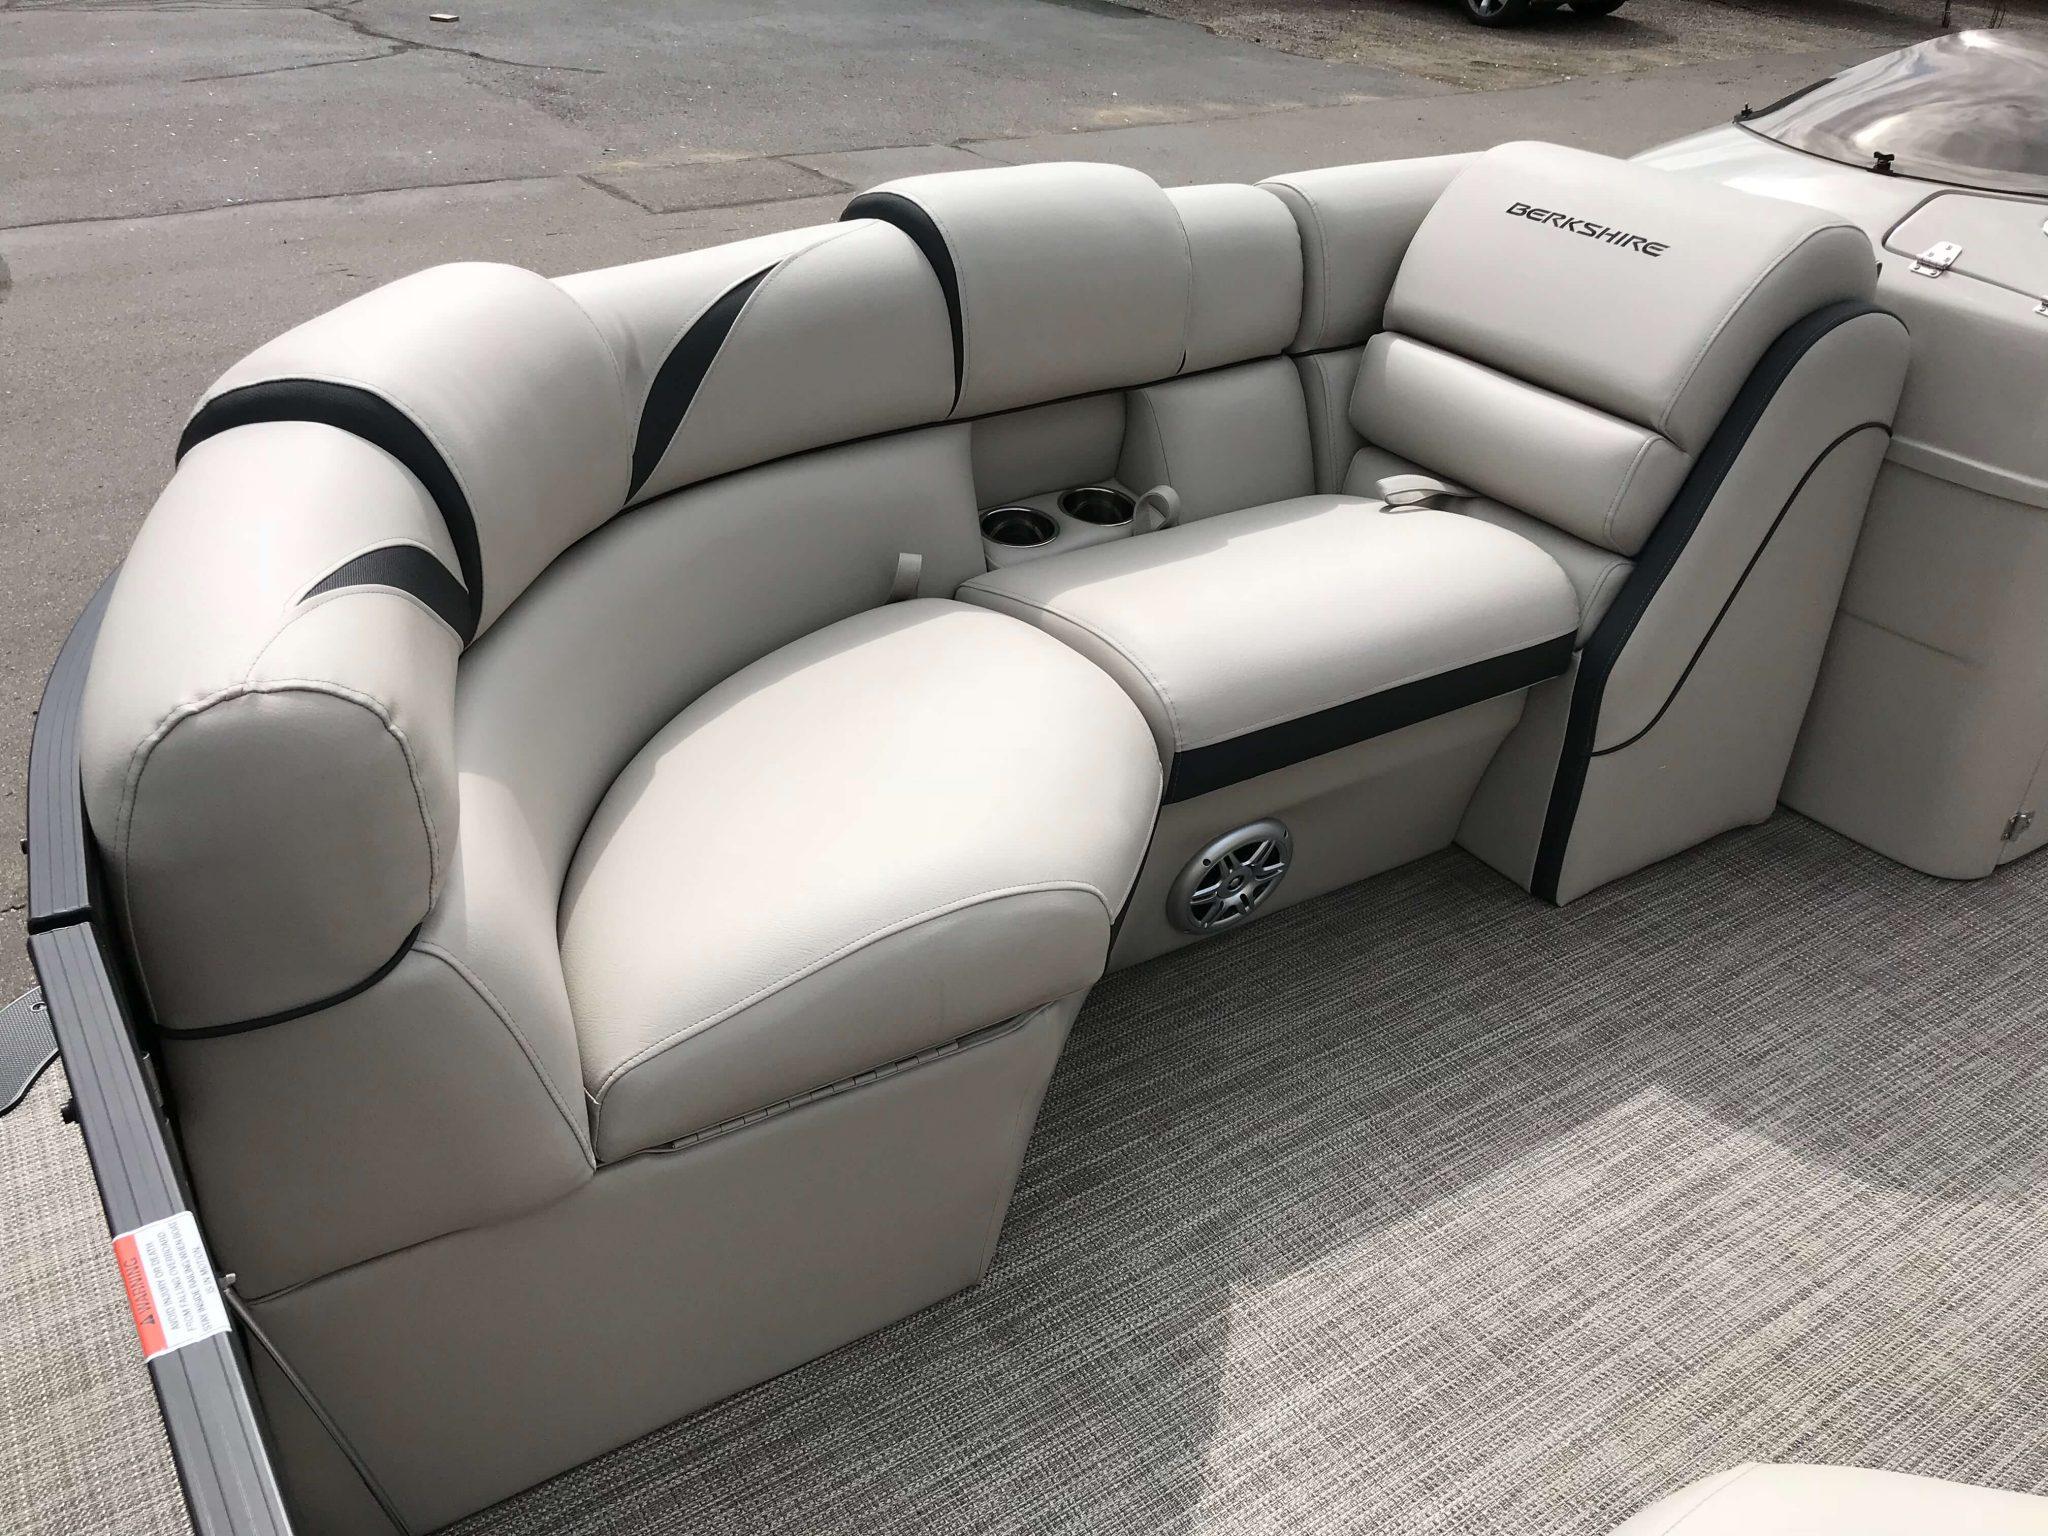 2019 Berkshire 23 SB2 STS Tritoon Interior Bow Seating 4